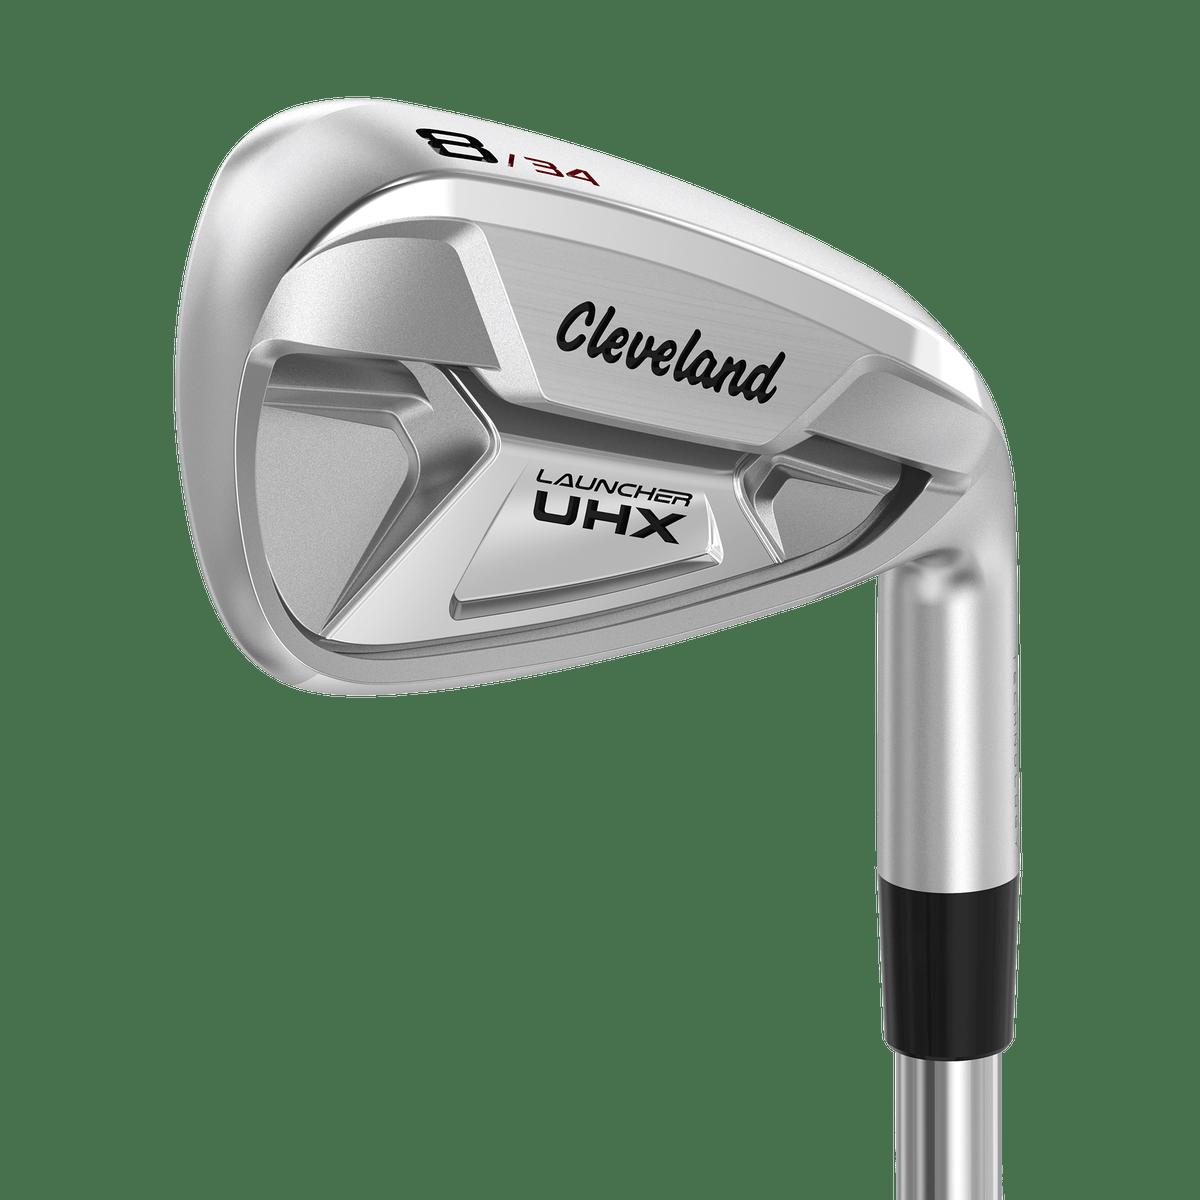 Cleveland Launcher UHX Dual Wedge